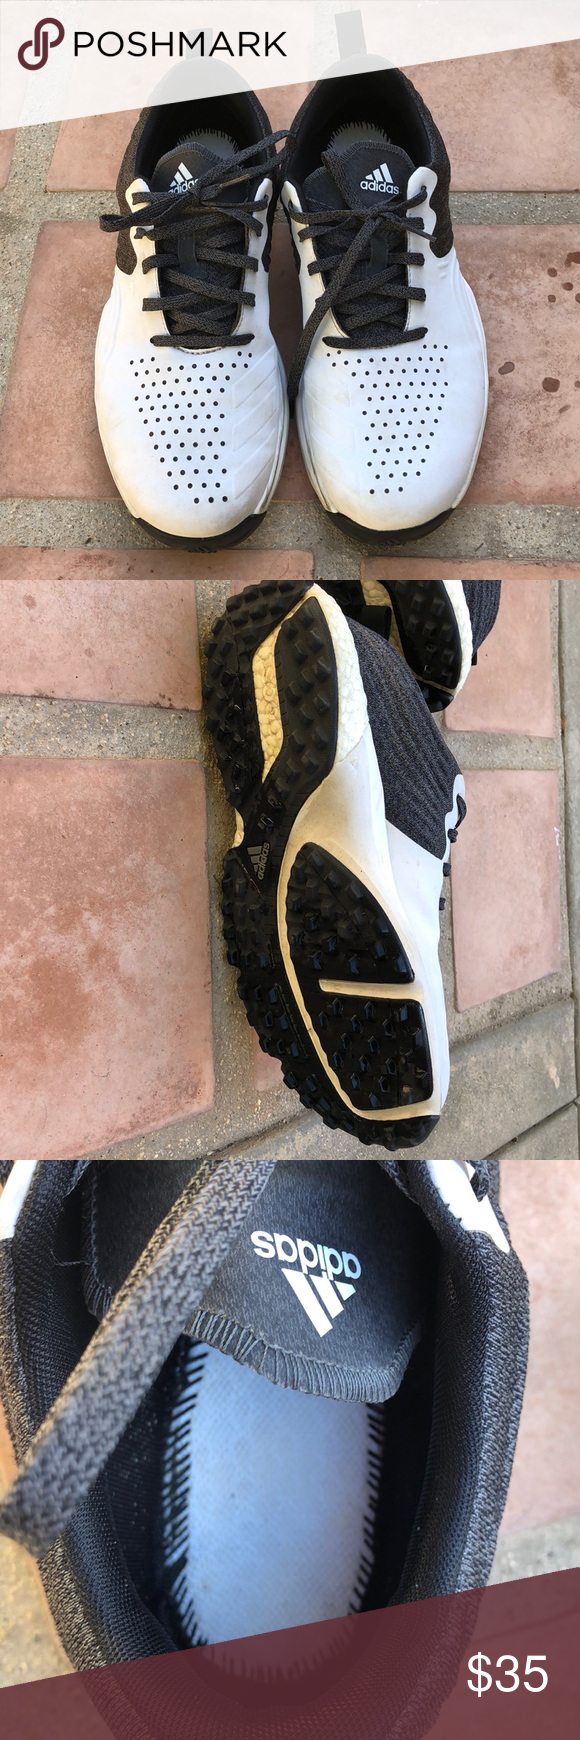 20++ Adidas golf shoes 95 ideas